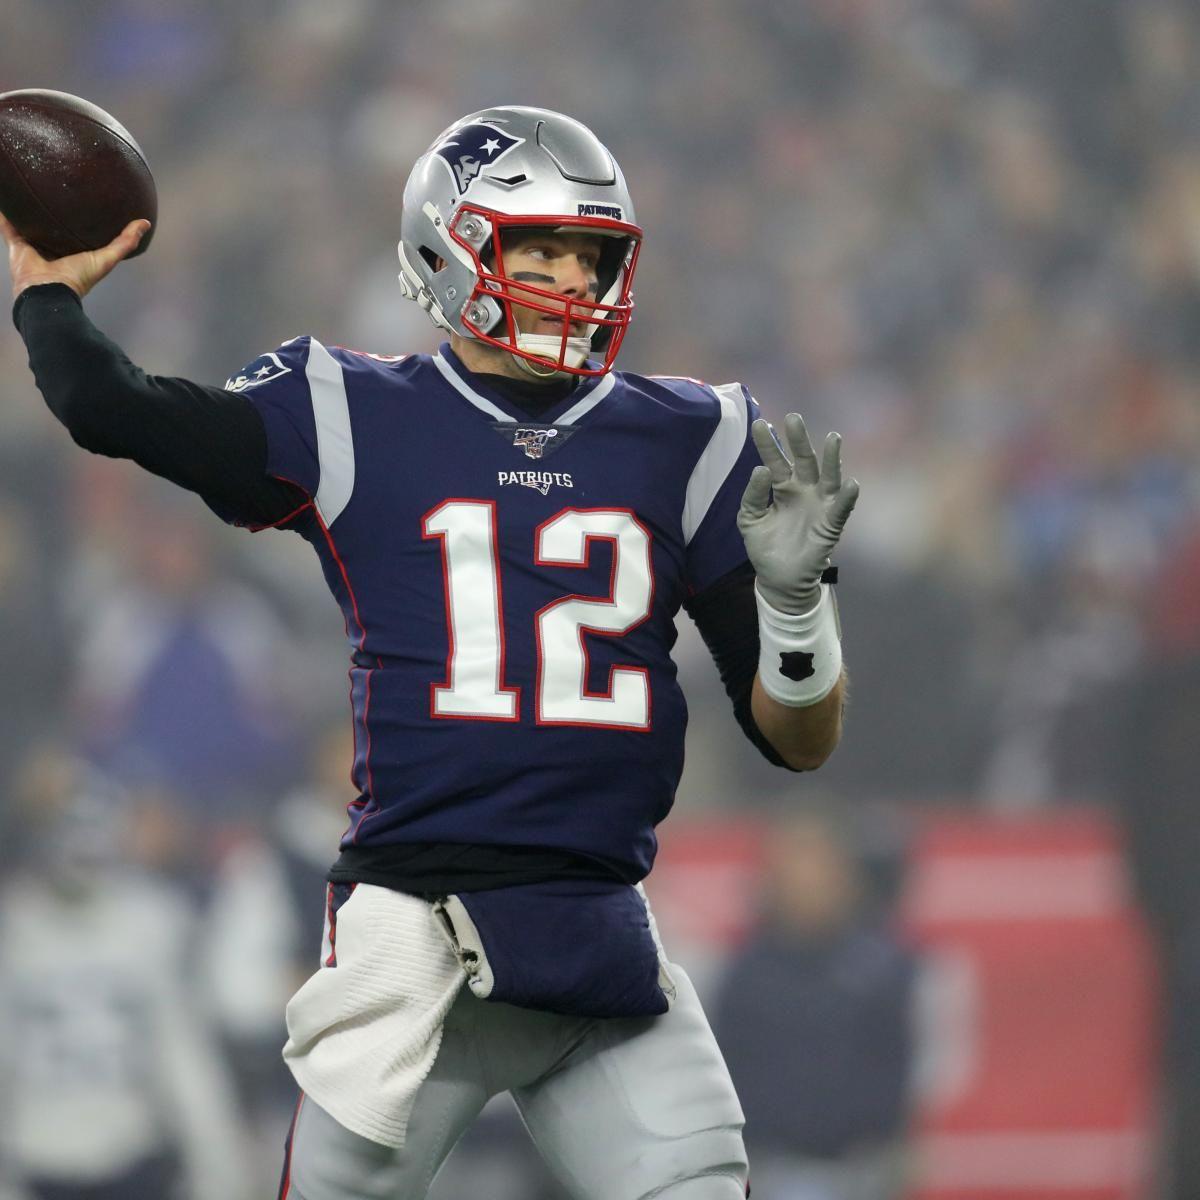 Robert Kraft My Hope And Prayer Is Tom Brady Returns To Patriots Or Retires In 2020 Tom Brady Patriots Winners And Losers